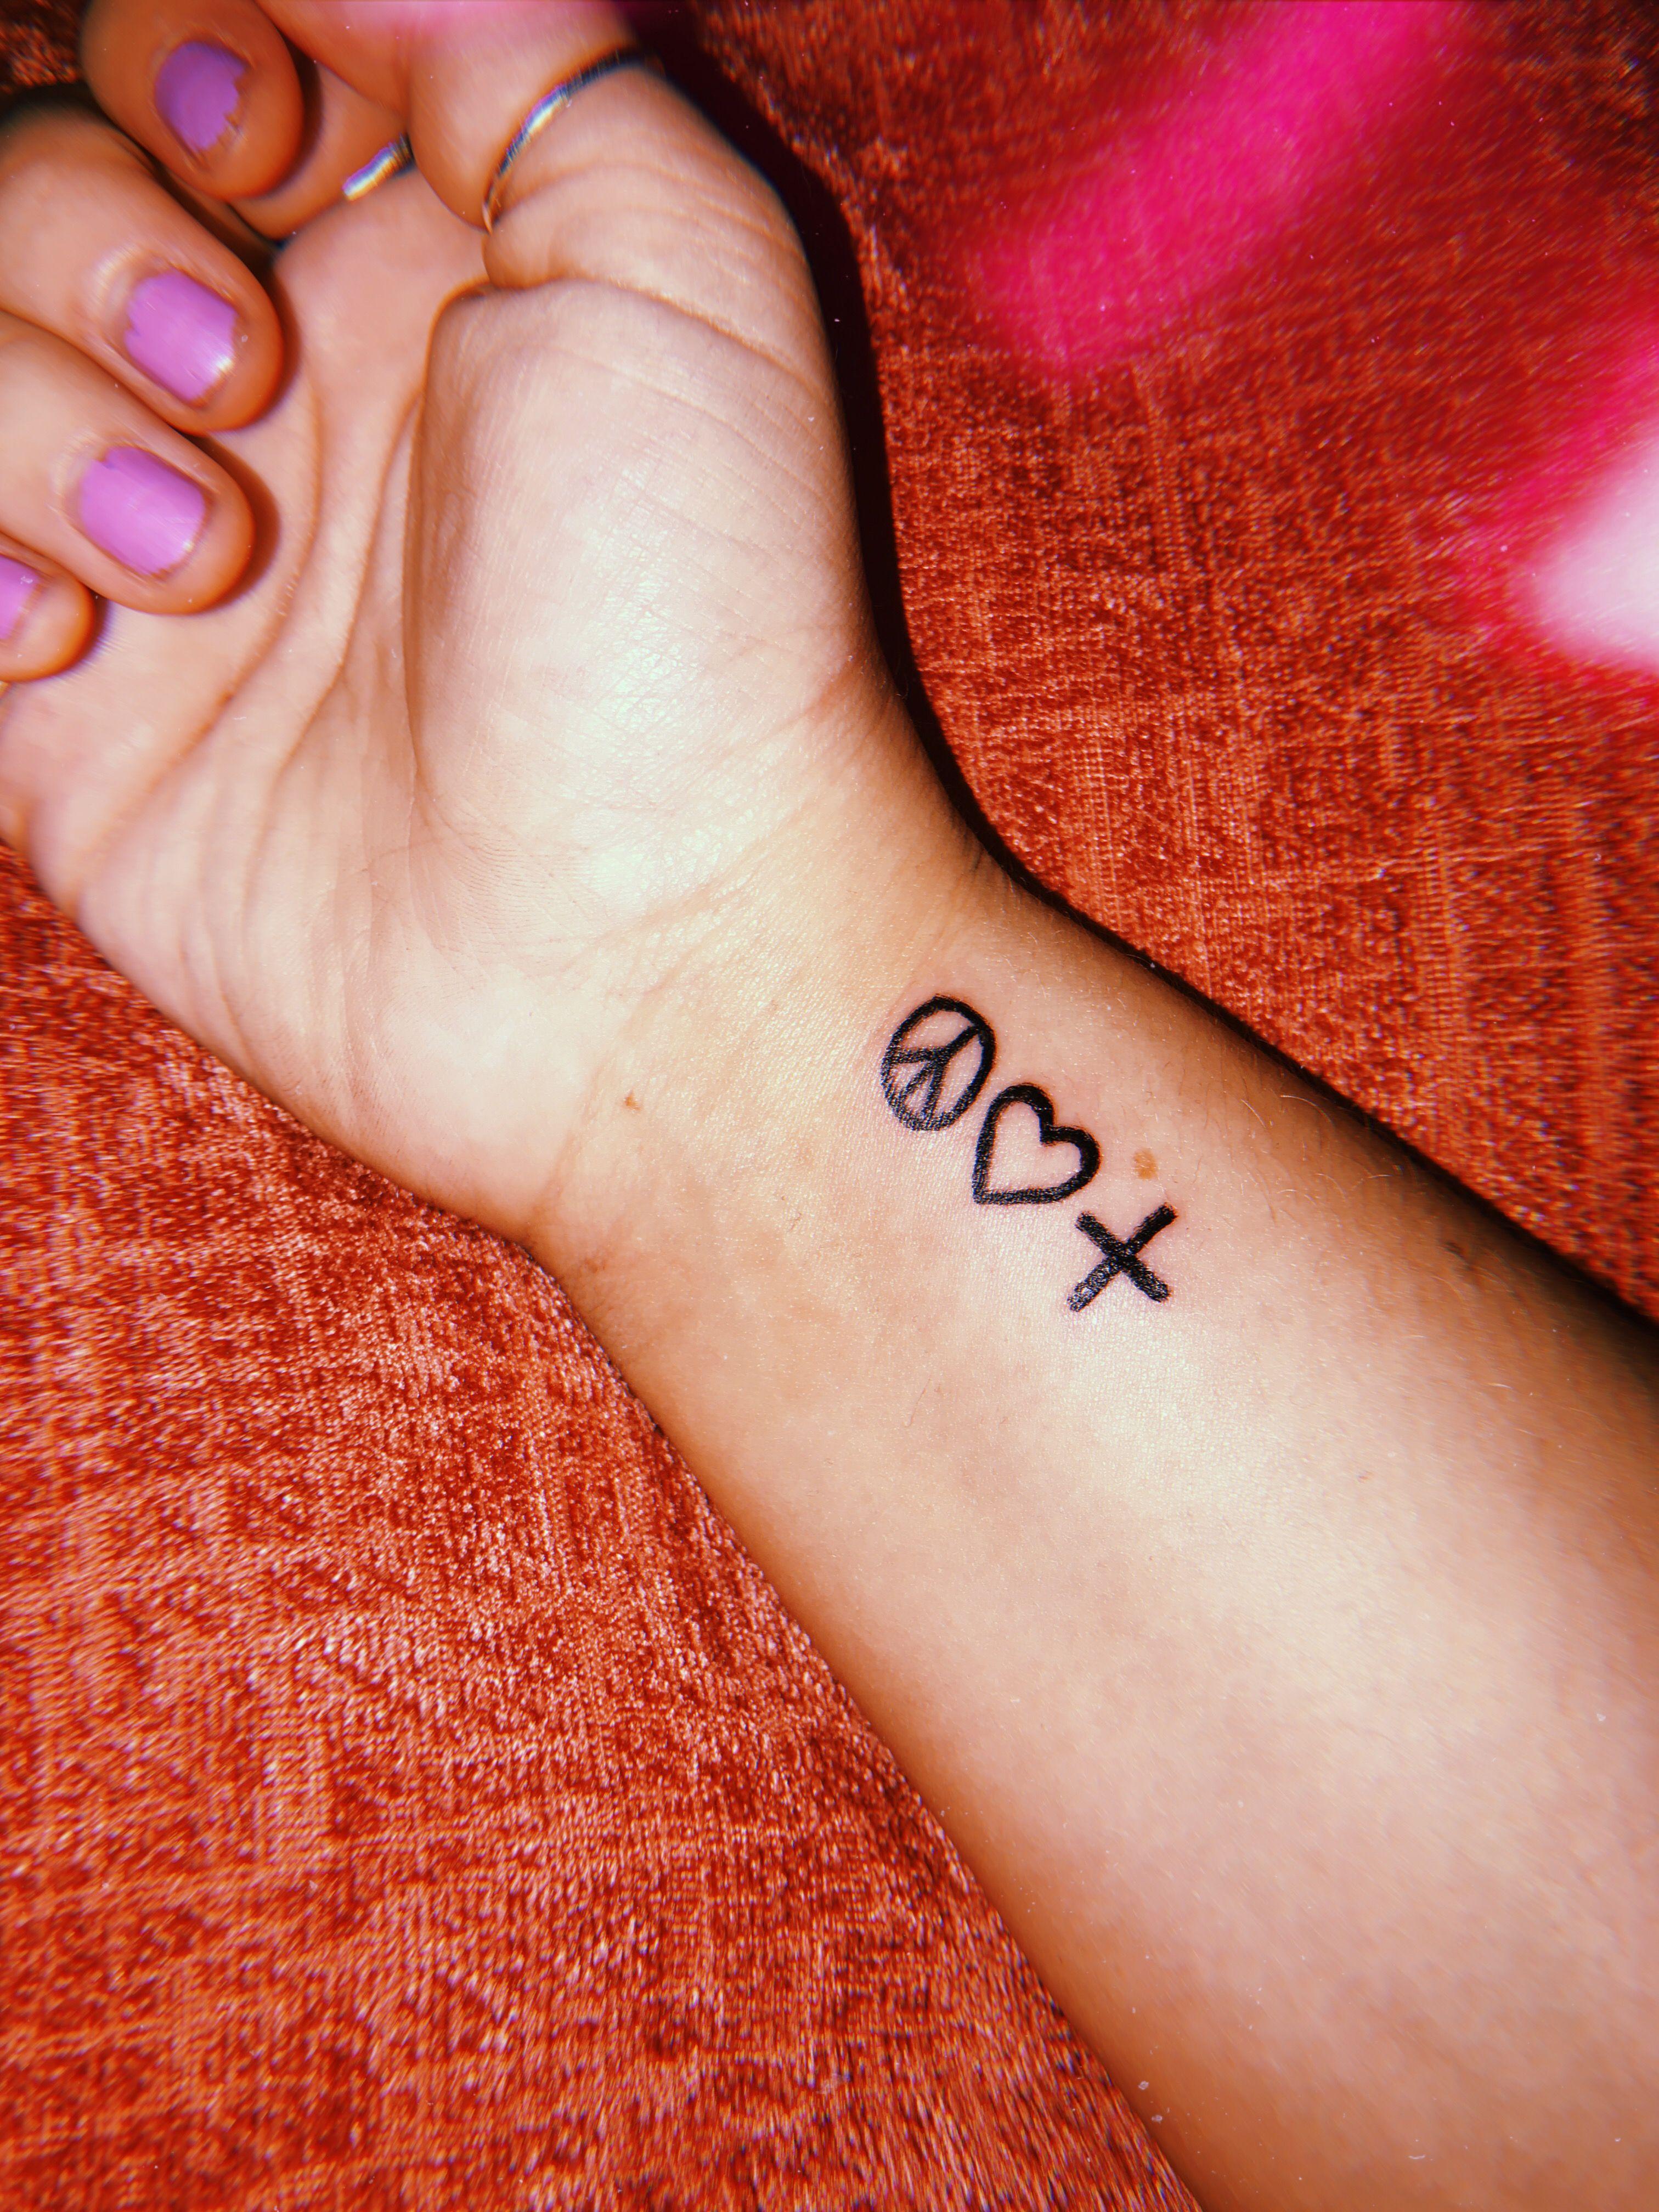 Peace Love And Positivity Logic Positivity Tattoo Small Tattoos Peace Tattoos